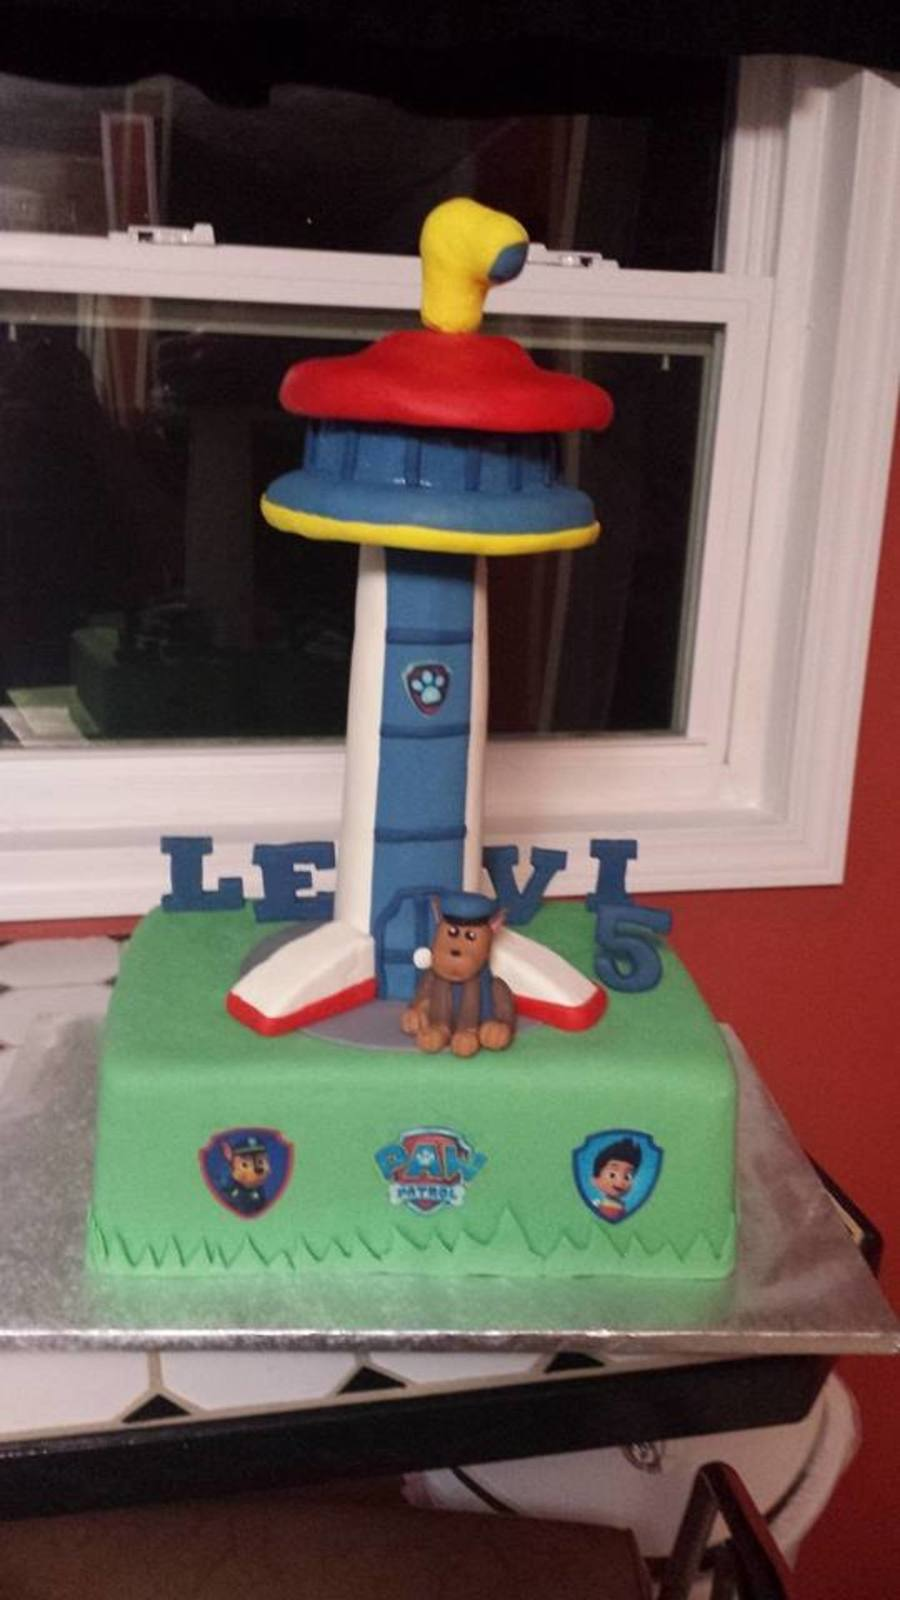 Square Paw Patrol St Birthday Cake